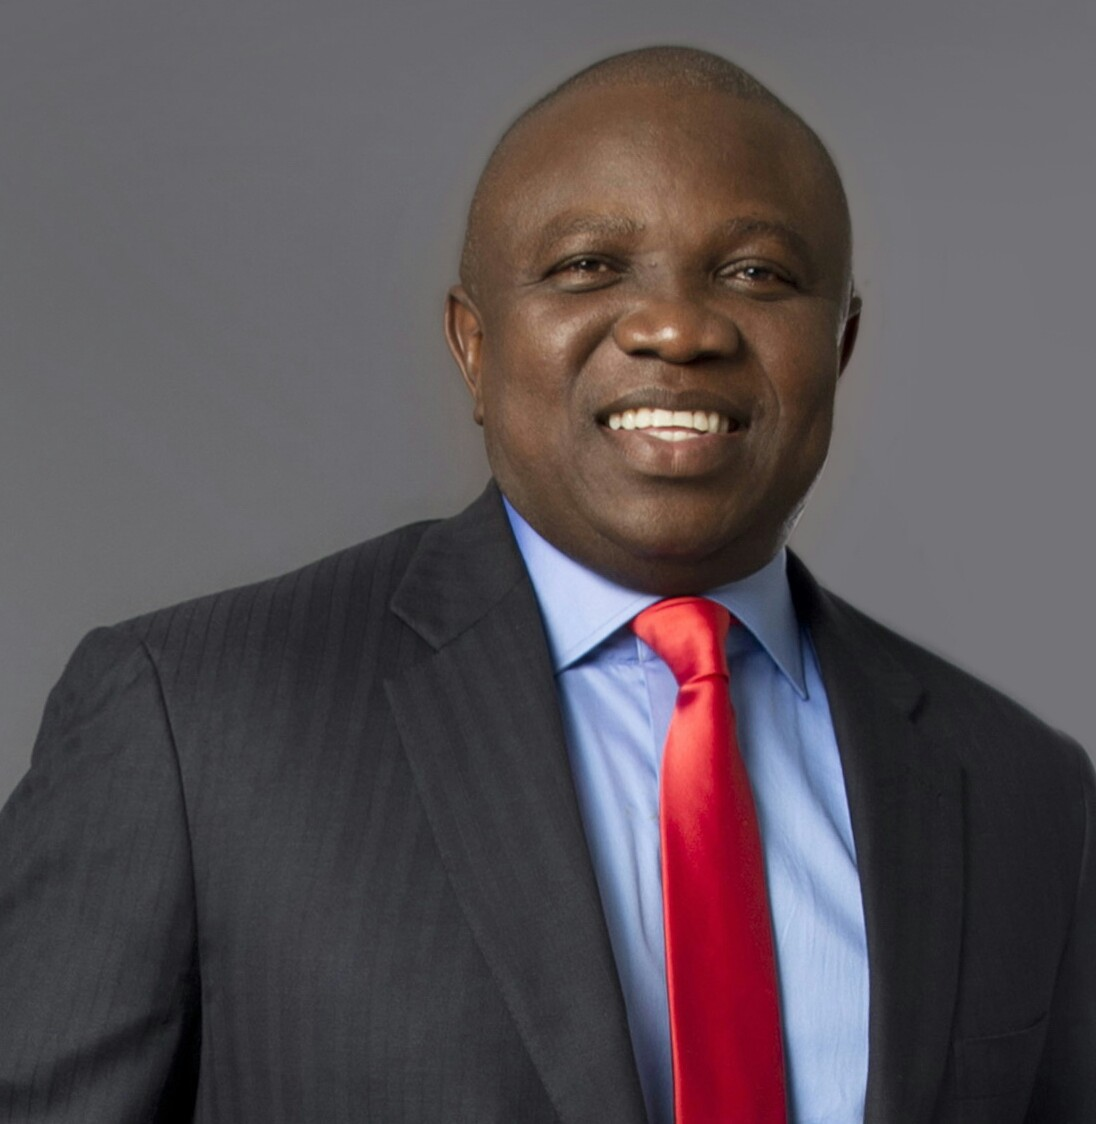 Akinwunmi Ambode, Lagos State Governor